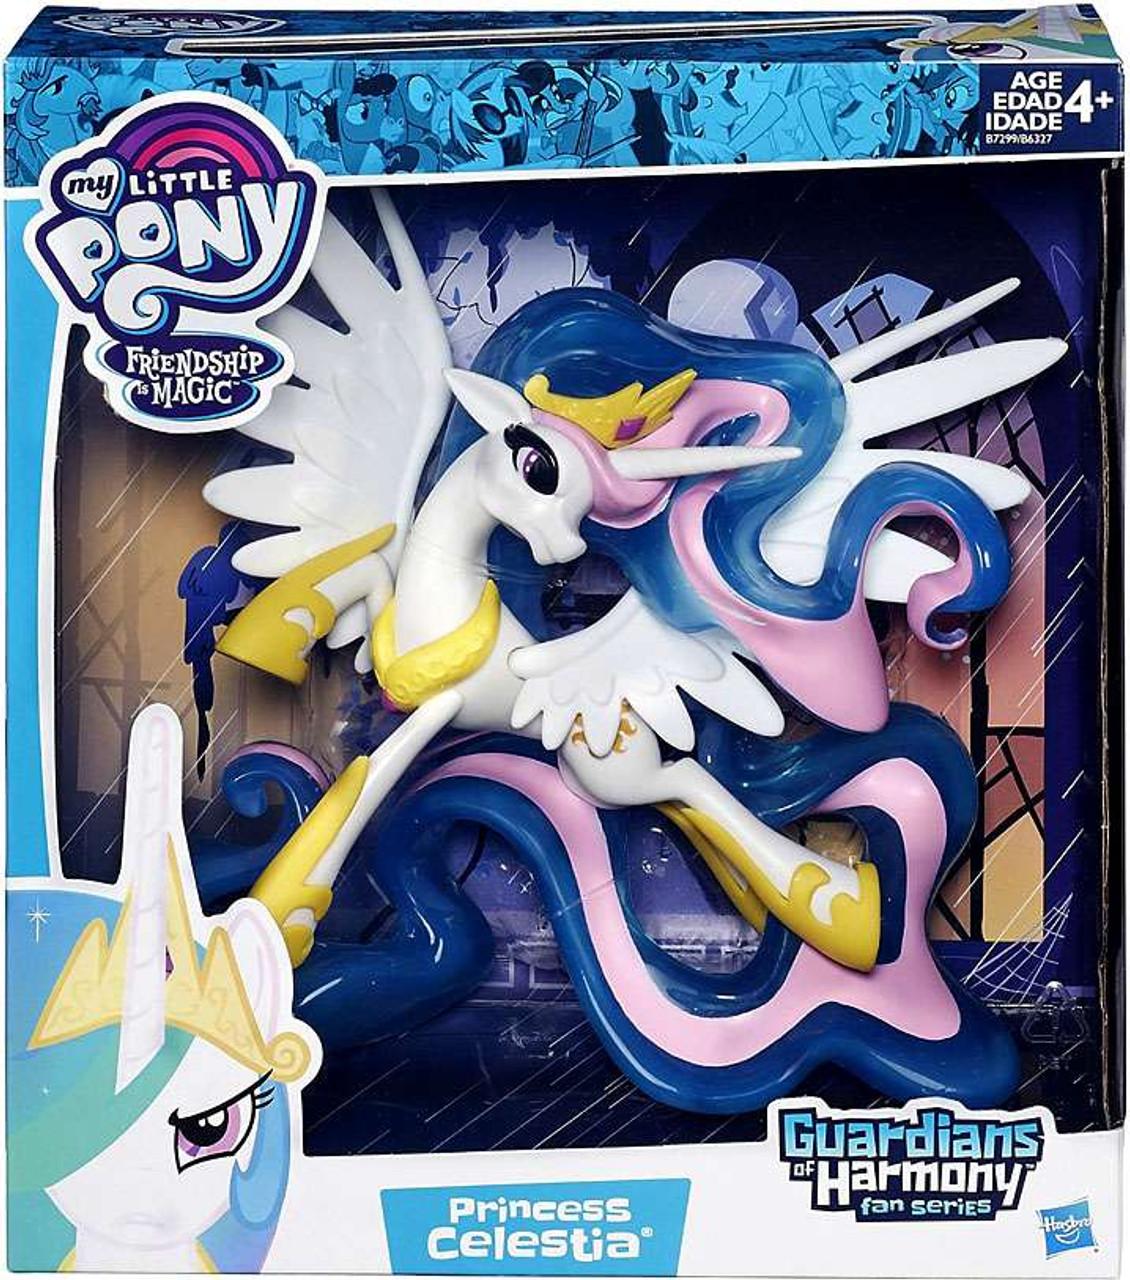 My Little Pony Guardians of Harmony Fan Series Princess Celestia